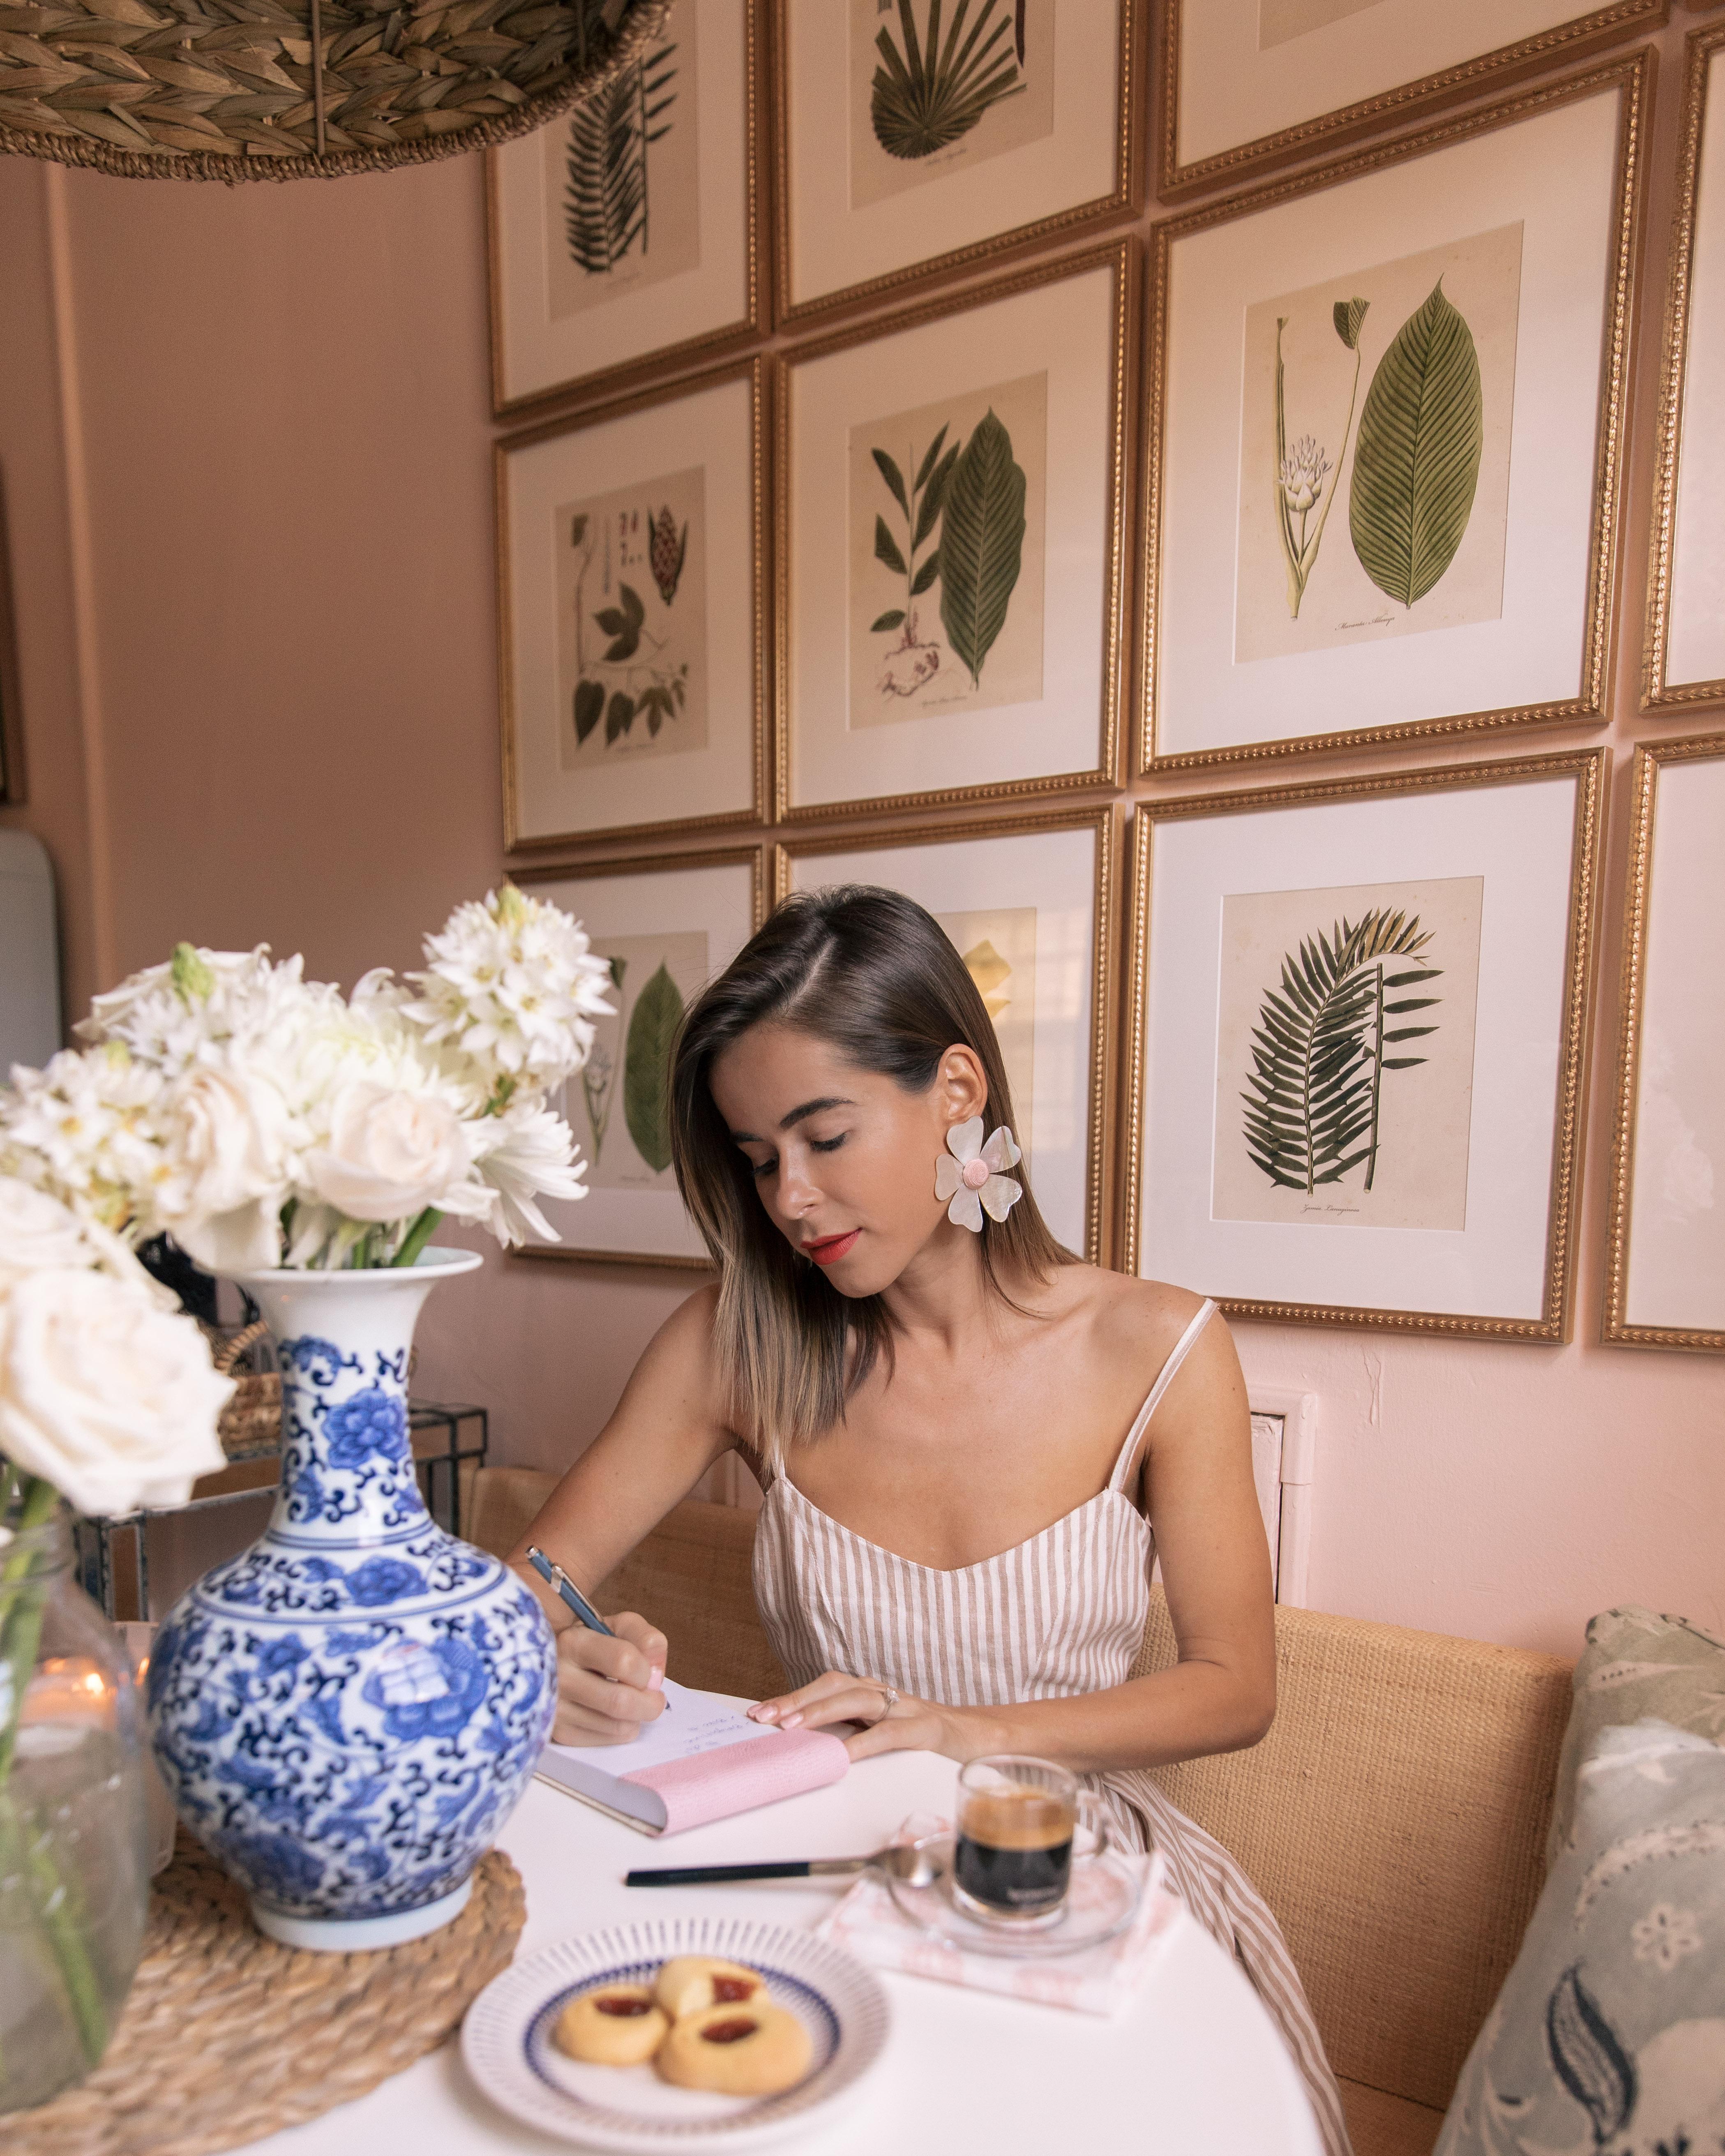 Stephanie Hill shares #MySmallSteps toward Sustainability on The Style Bungalow